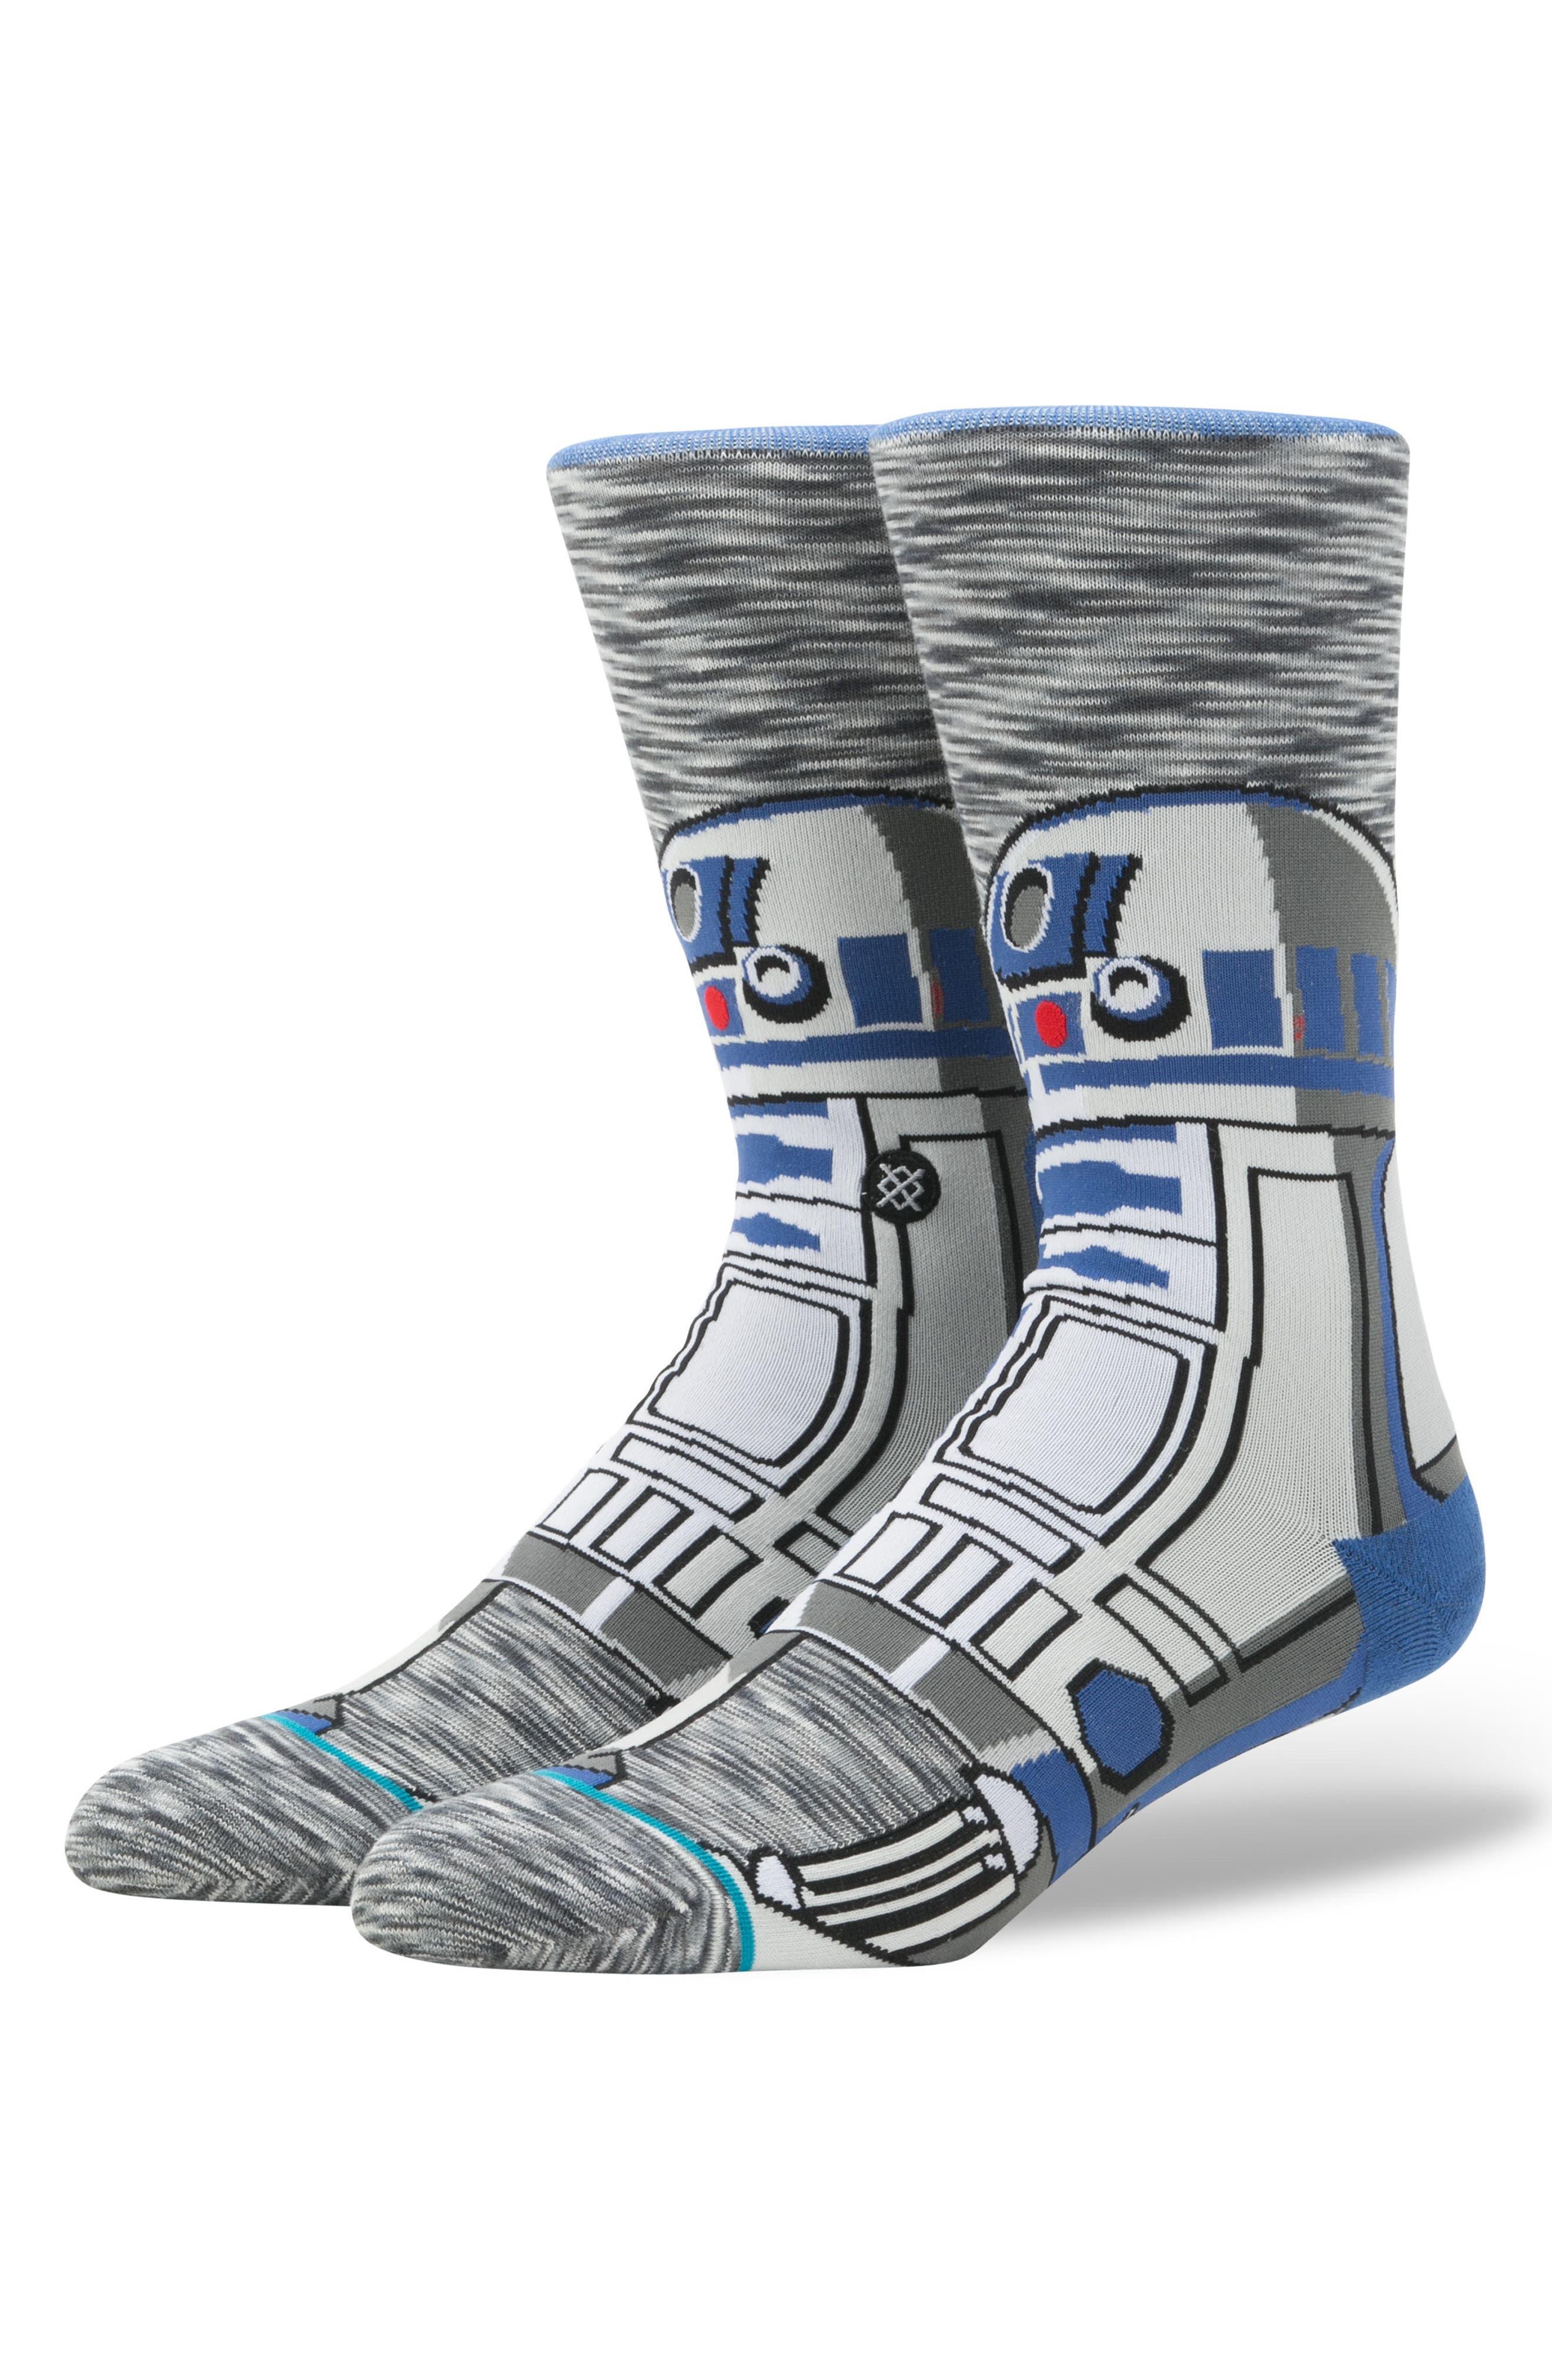 Star Wars<sup>™</sup> - R2D2 Socks,                         Main,                         color, Grey